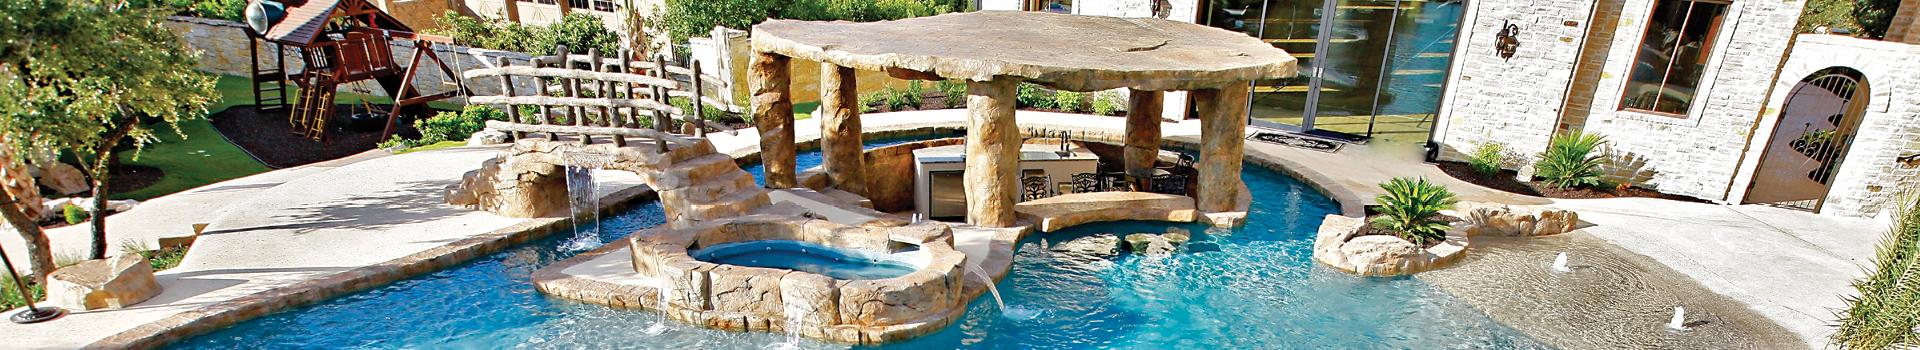 Pool with bridge and island kitchen